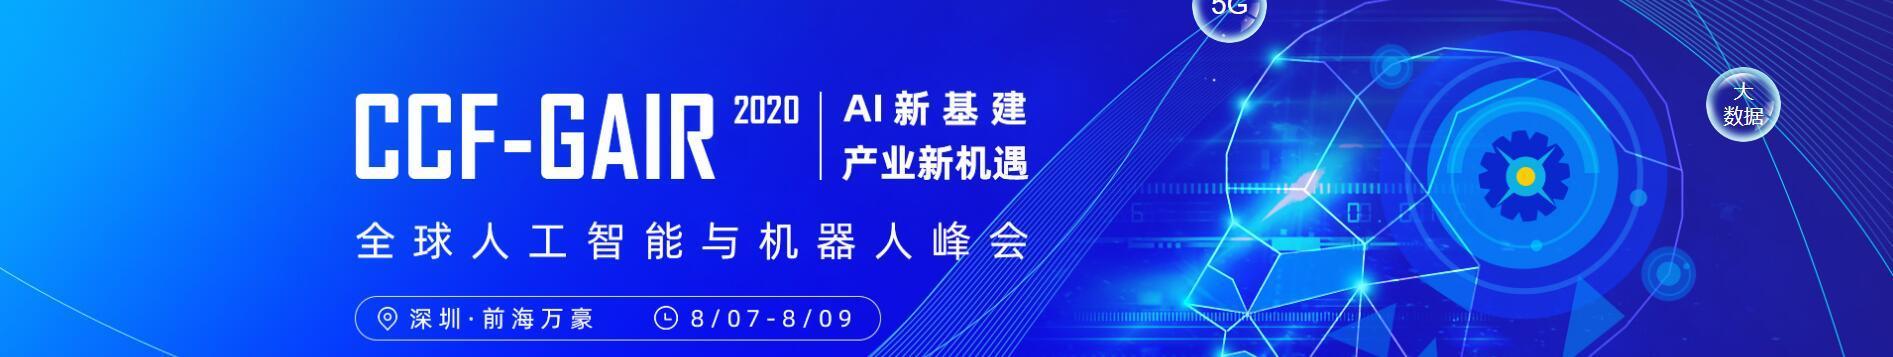 2020CCF-GAIR全球人工智能與機器人峰會(8月深圳)